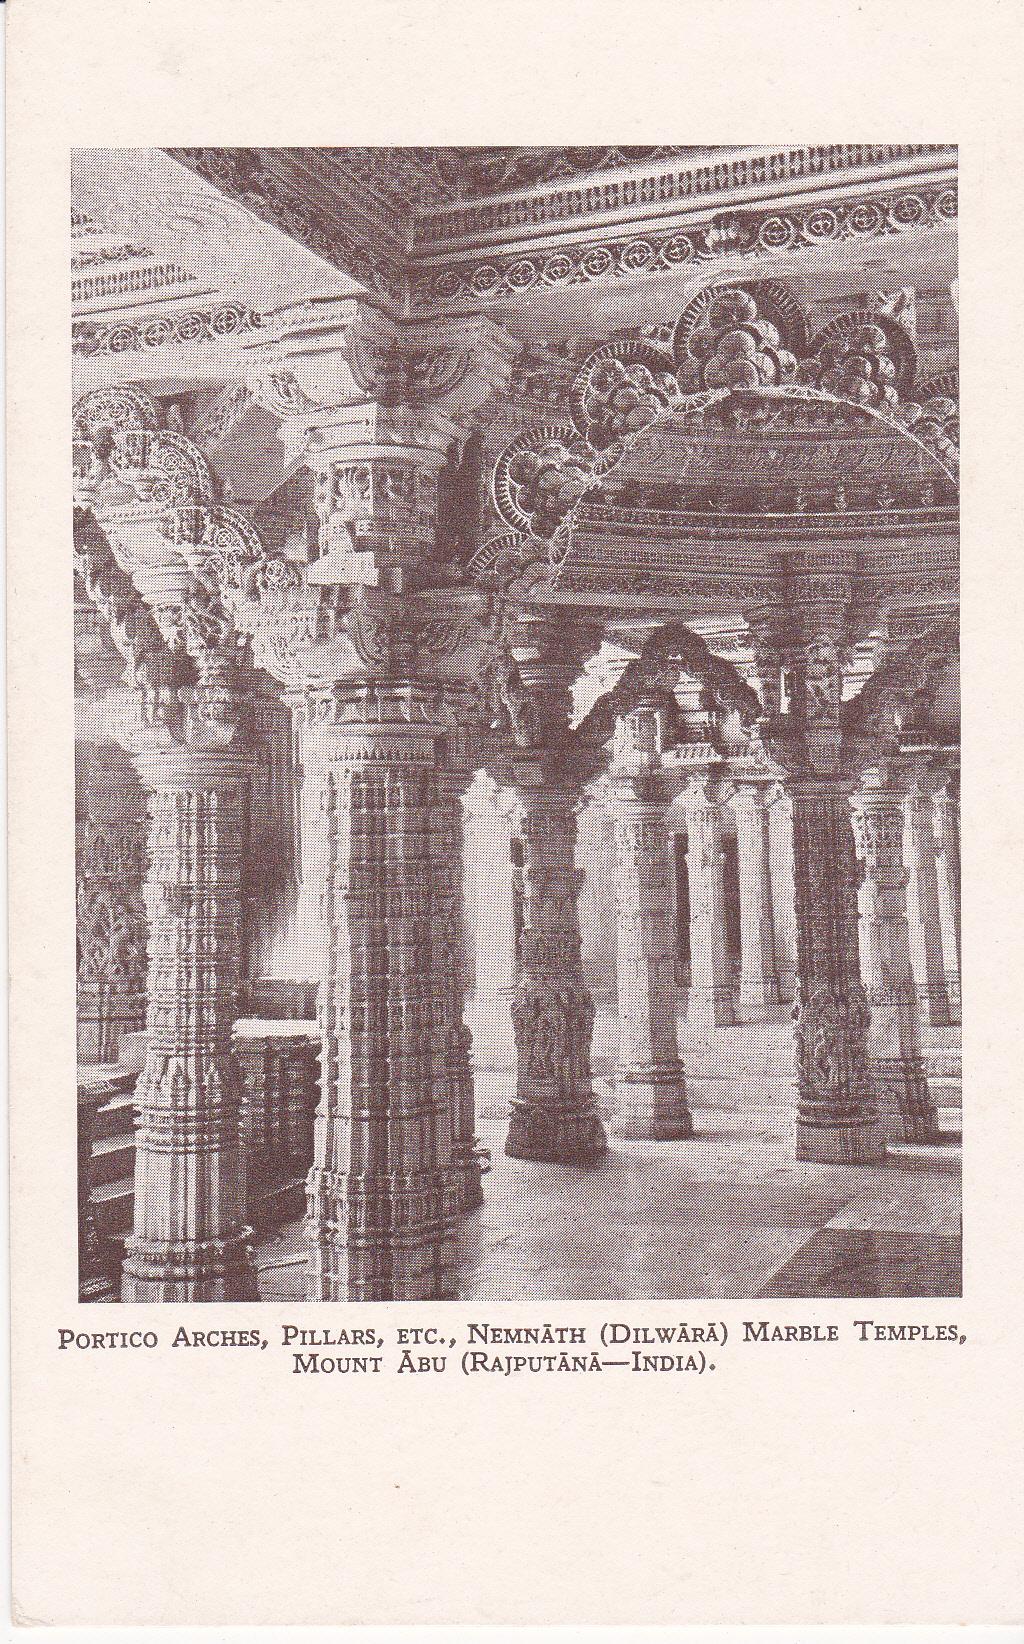 Portico Arches, Pillars, etc. Neminath Dilwara Marble Temples Mount Abu